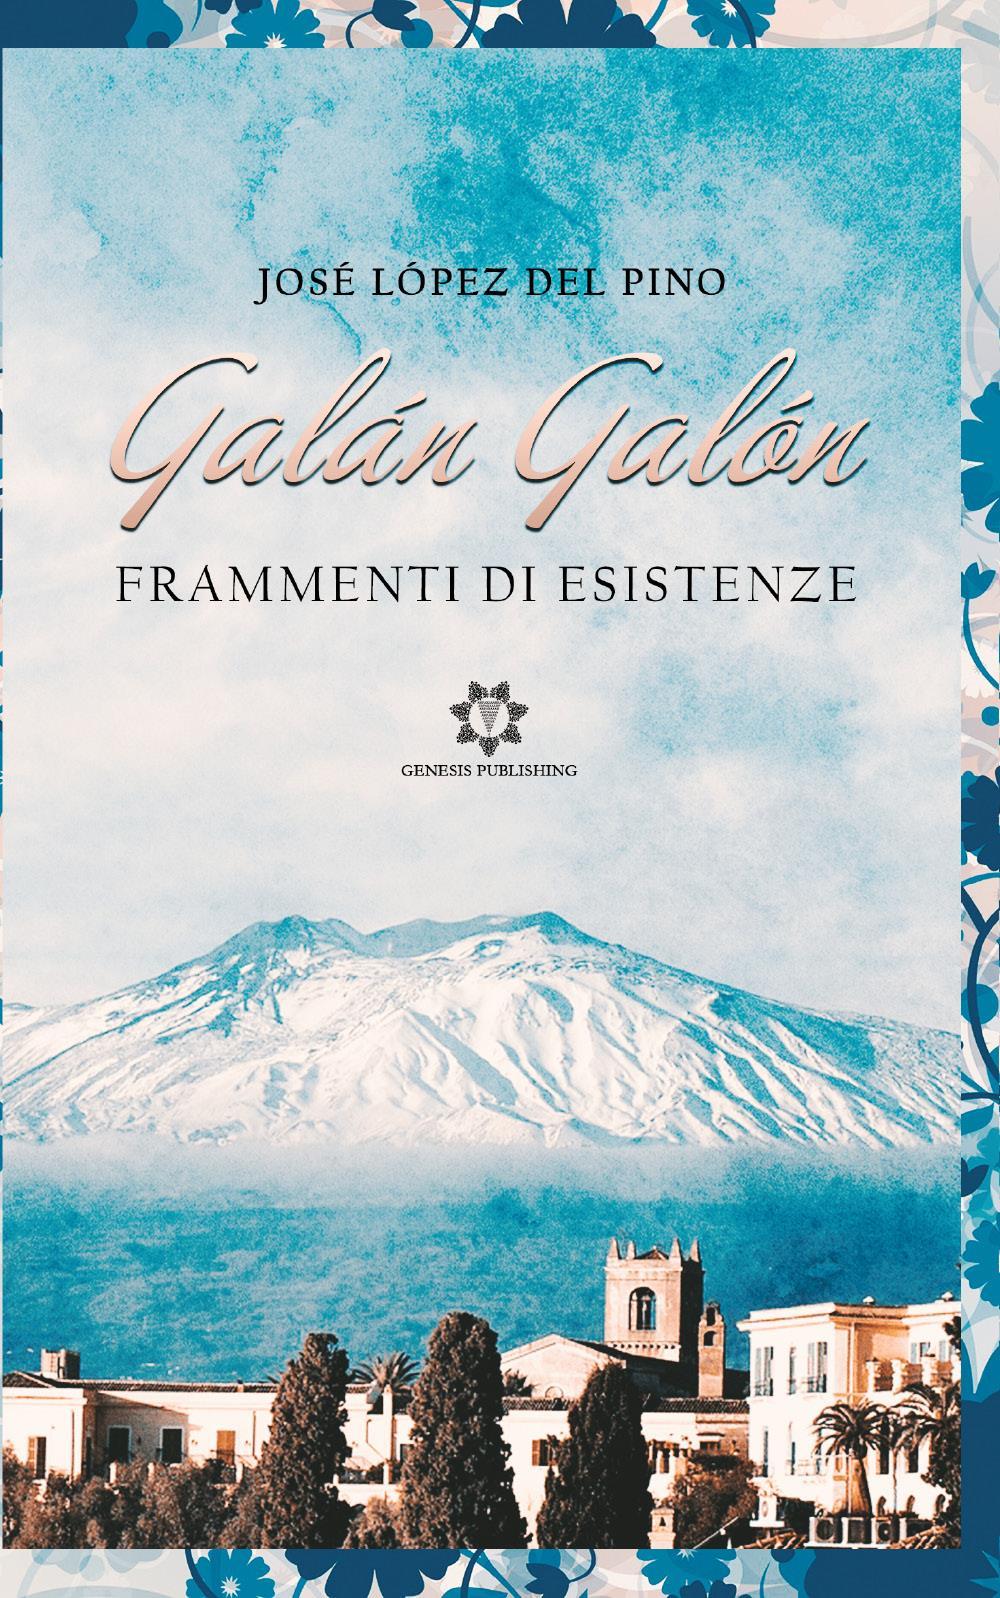 Galán Galón - Frammenti di esistenza